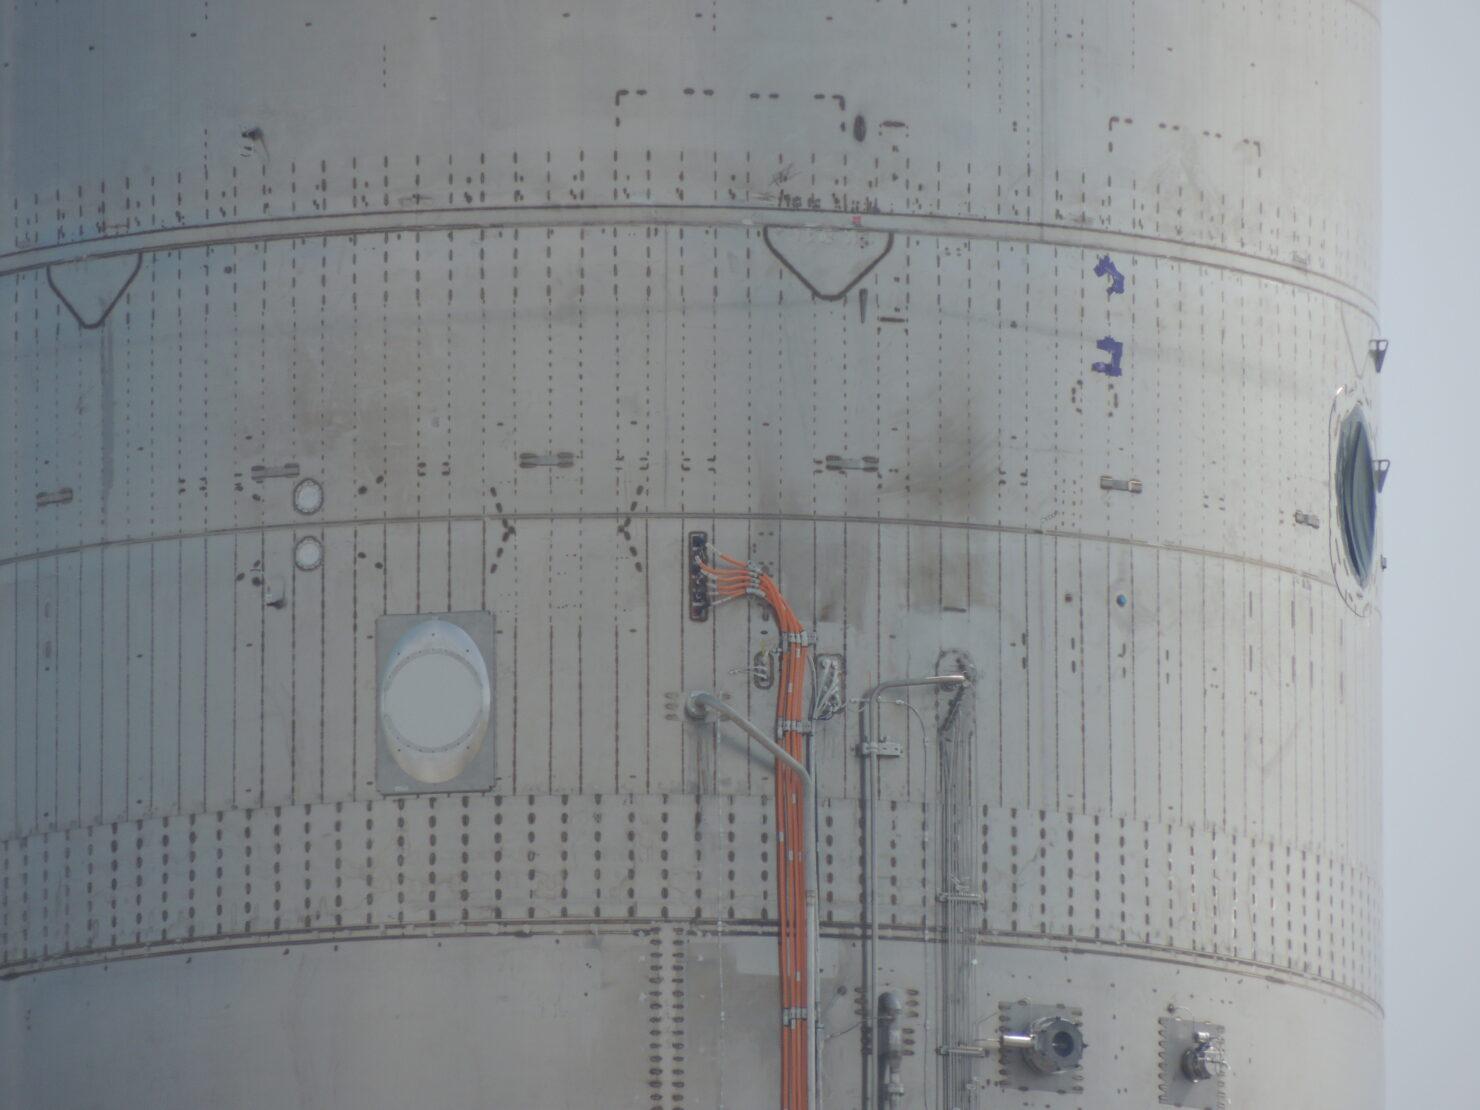 spacex-starship-sn15-starlink-2-carter-goode